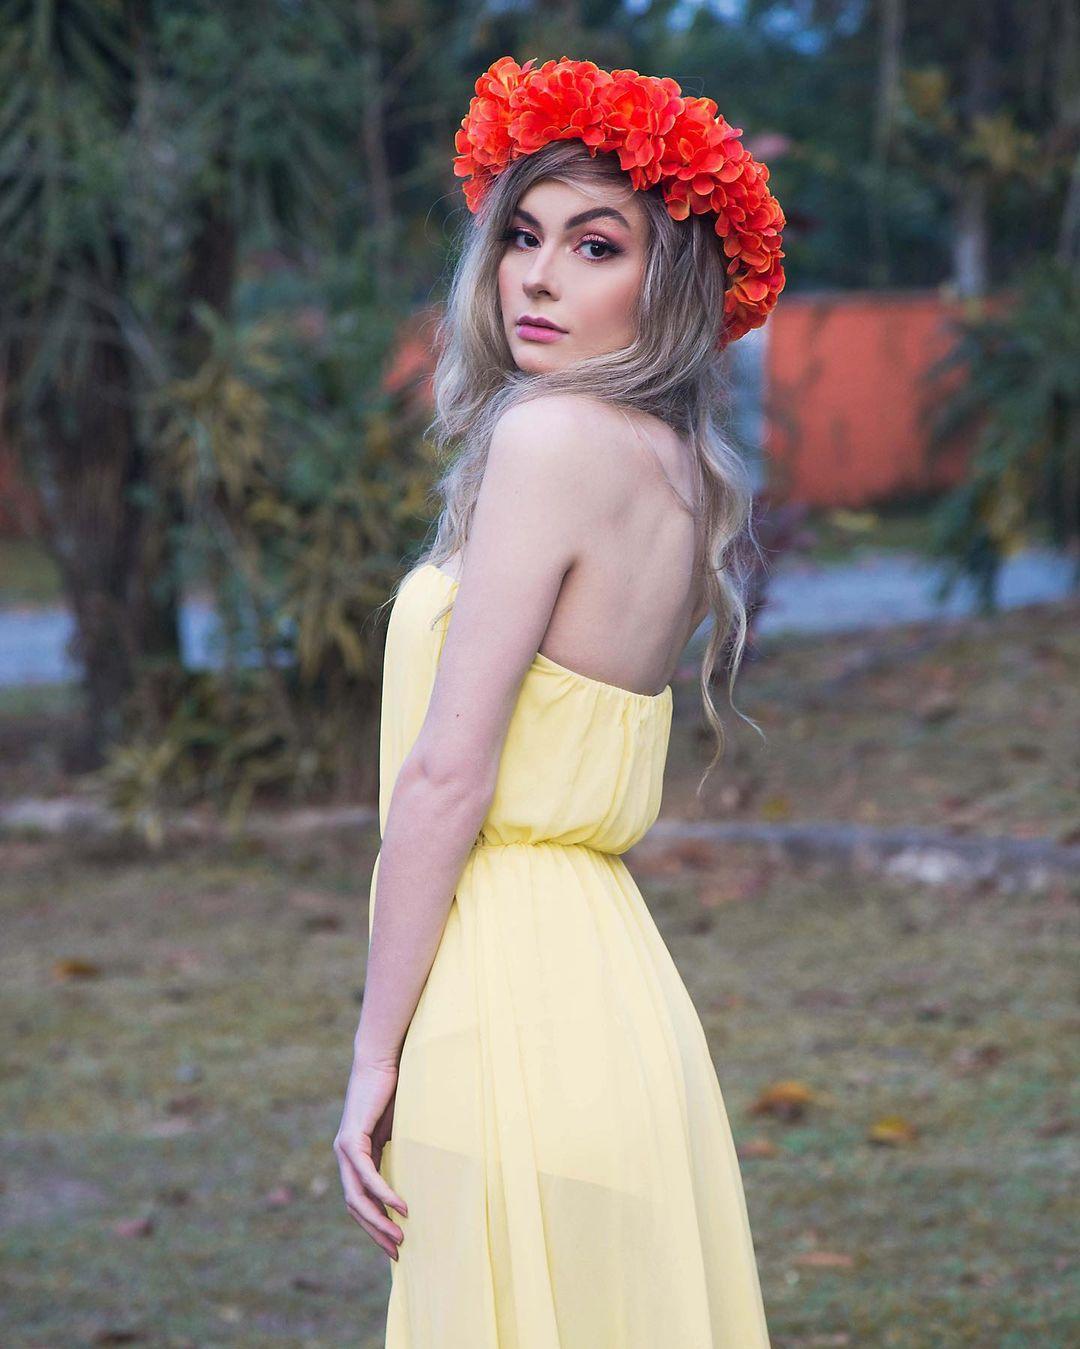 thais bonome, miss beleza da grande sao paulo 2020/miss abcd mundo 2019. 12626223